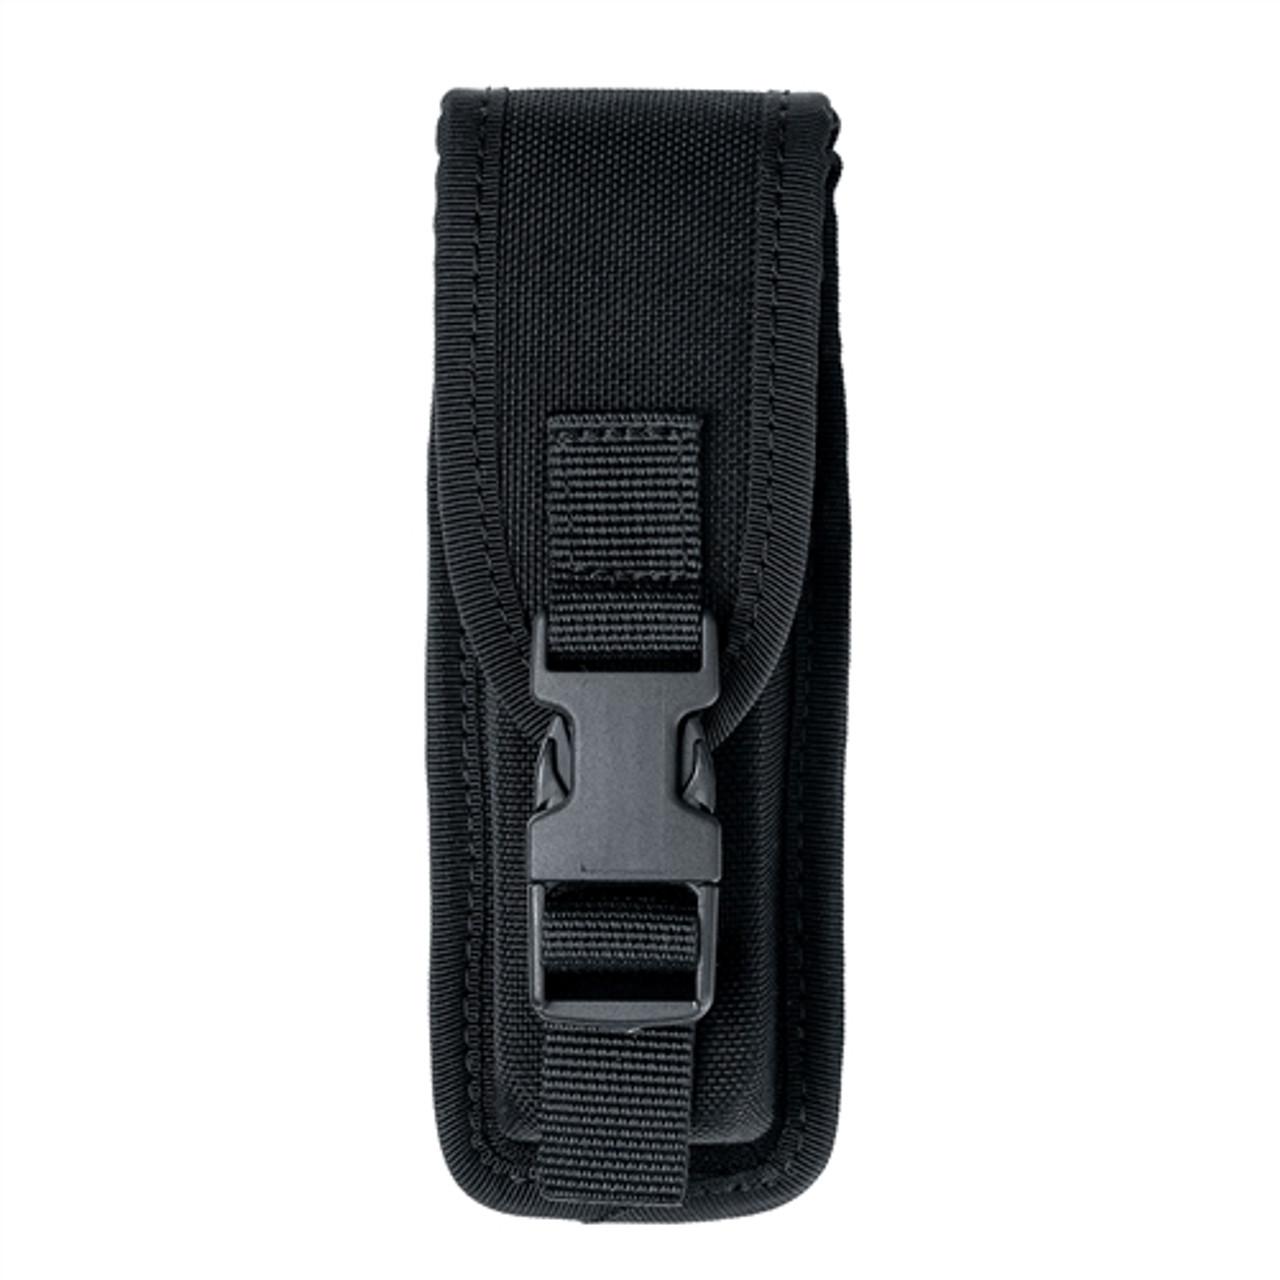 Steel Will Onrush 612 Flipper Folding Knife, G10 Handle, Black PVD Blade